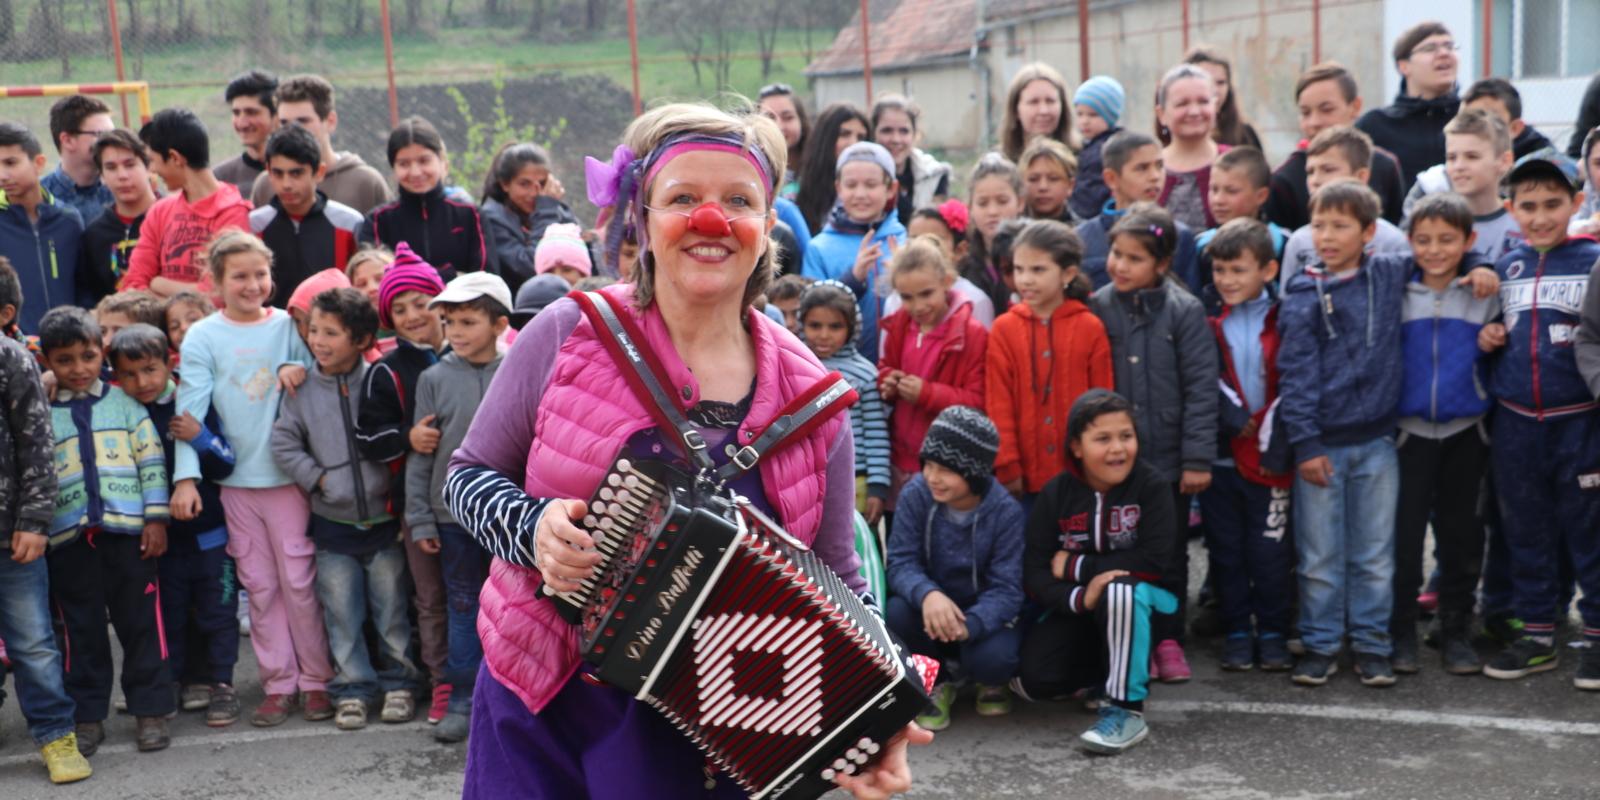 http://clownsohnegrenzen.org/wp-content/uploads/2018/05/Rumänien_2017_Jonas_Feichtl_IMG8598_1600x800_acf_cropped.jpg